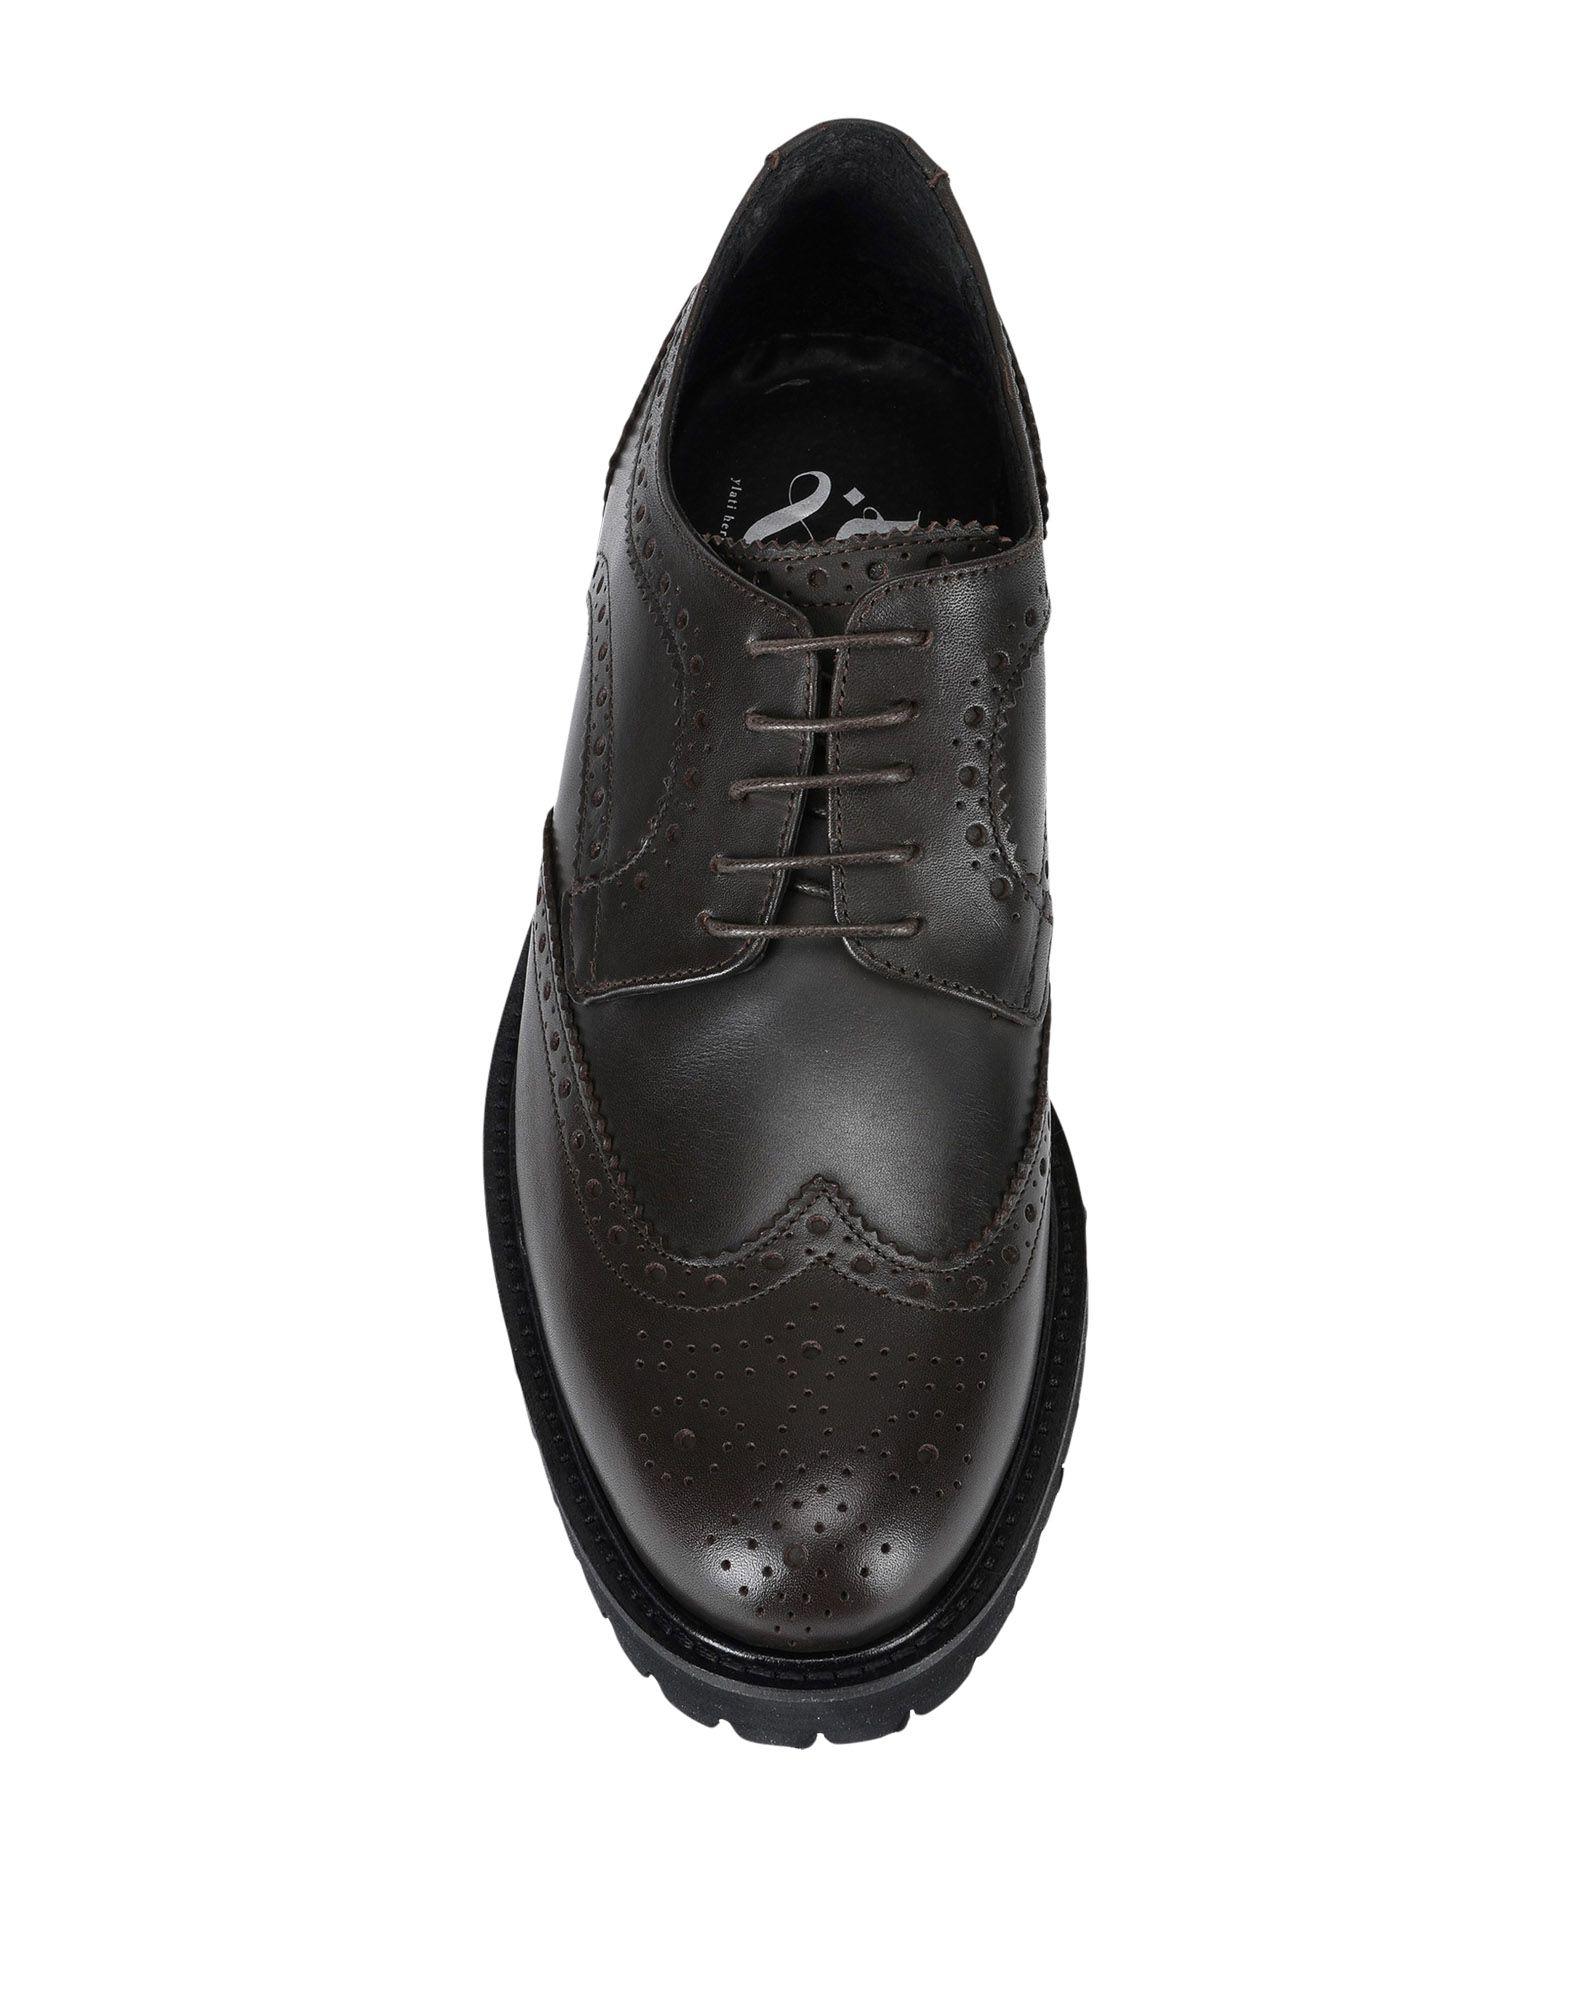 Ylati Heritage Schnürschuhe Herren  Schuhe 11482878SW Gute Qualität beliebte Schuhe  44e15d